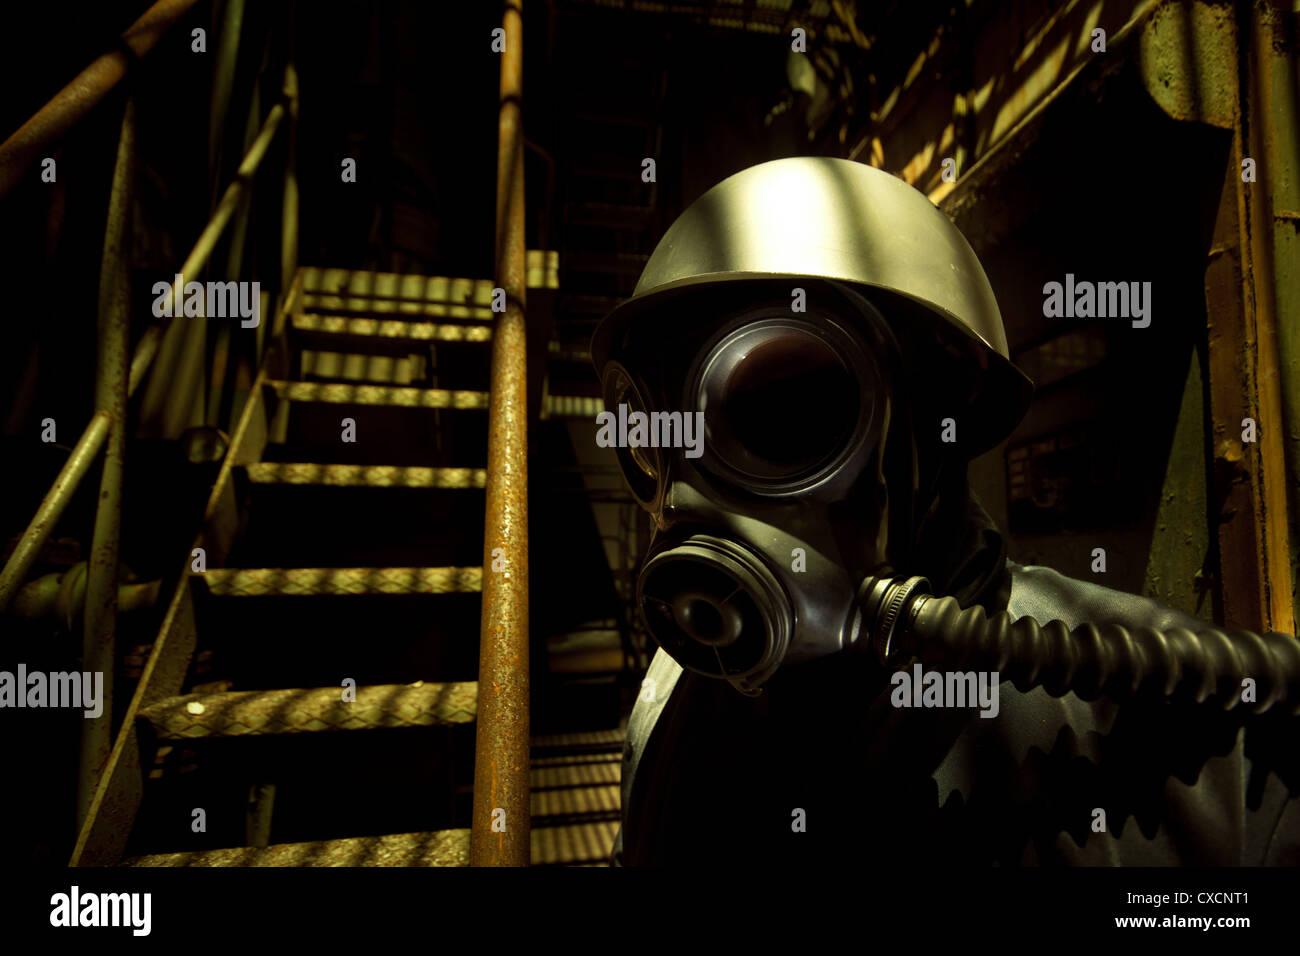 Ominous gas masked individual - Stock Image